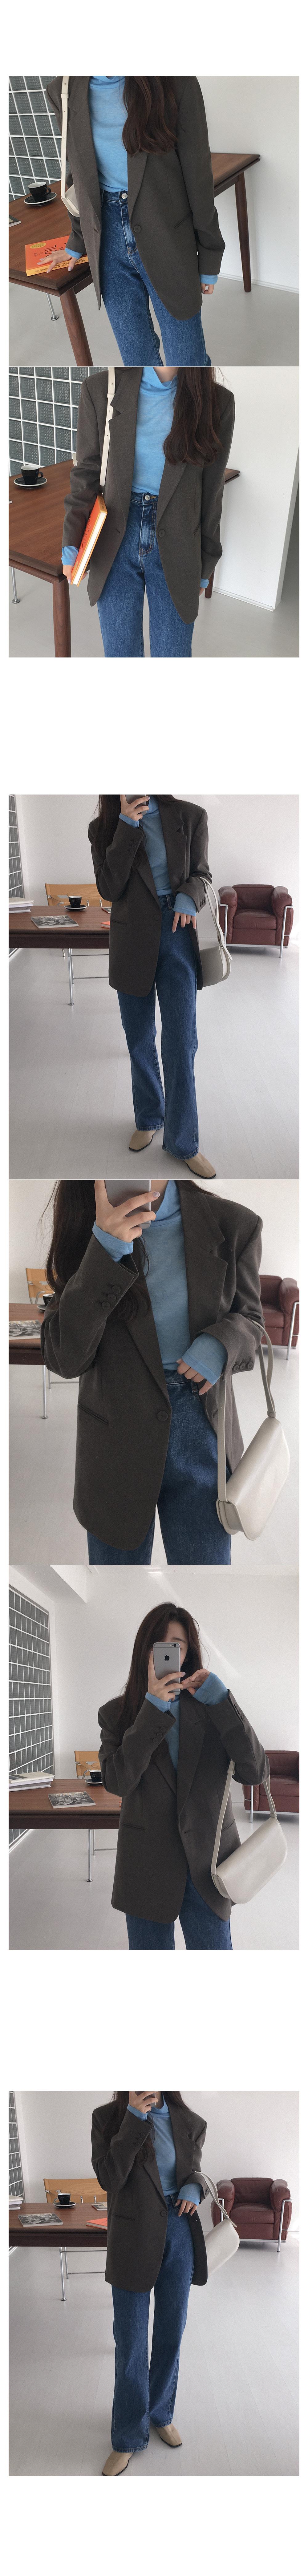 Gracie wool single jacket